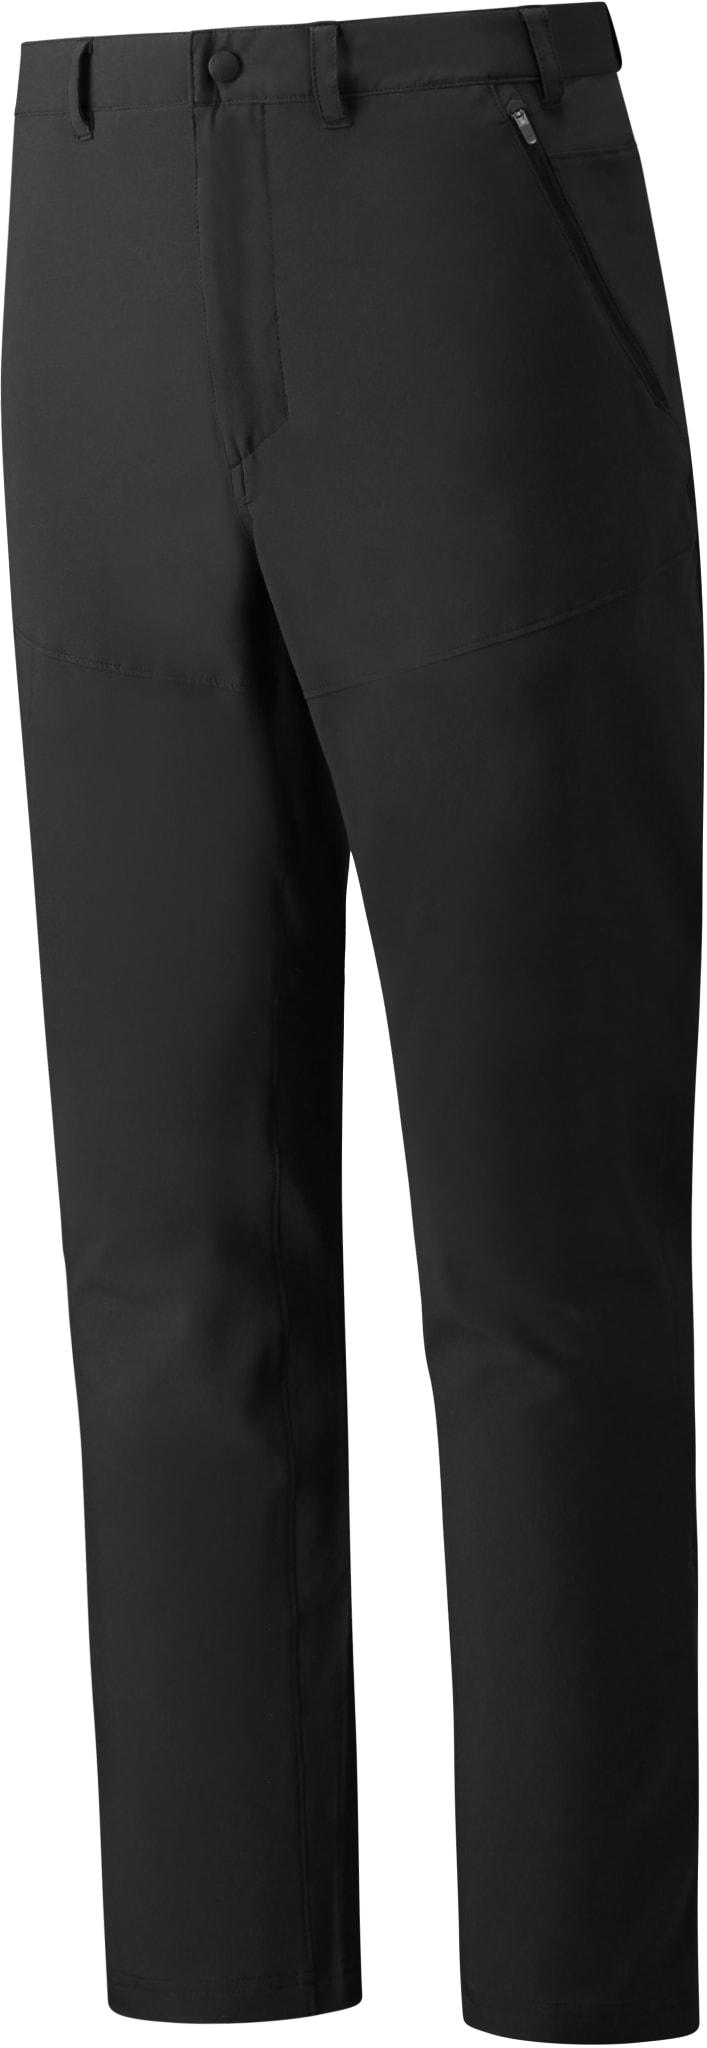 Altvia Trail Pants Regular M